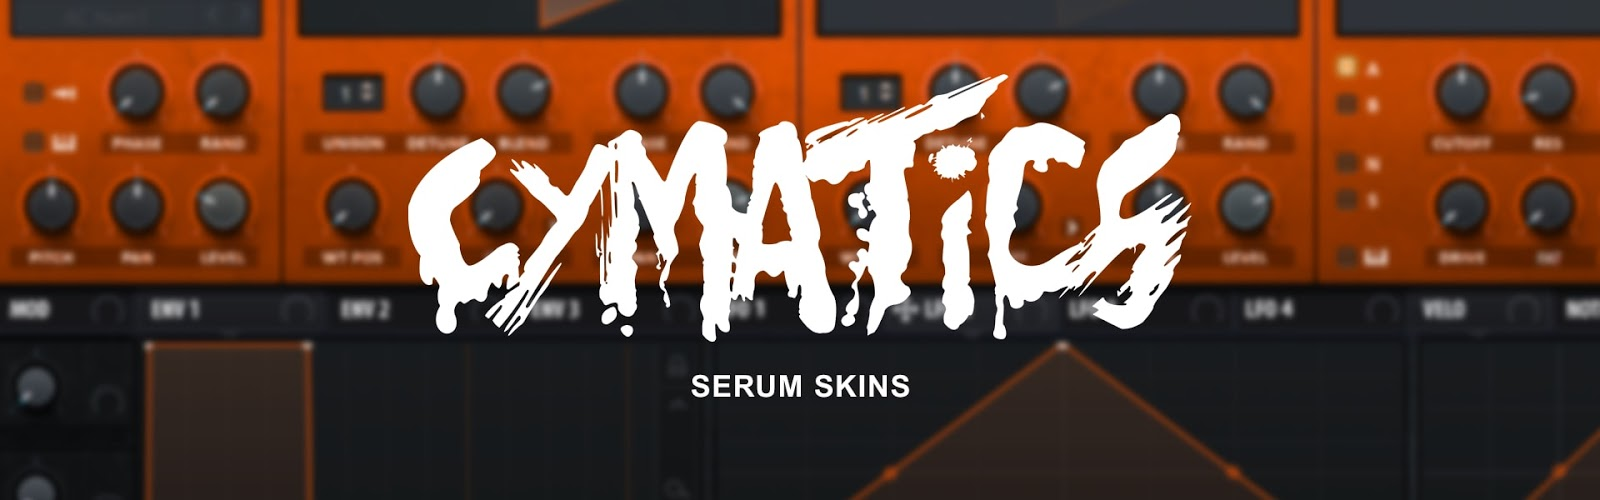 Cymatics Serum Skins2